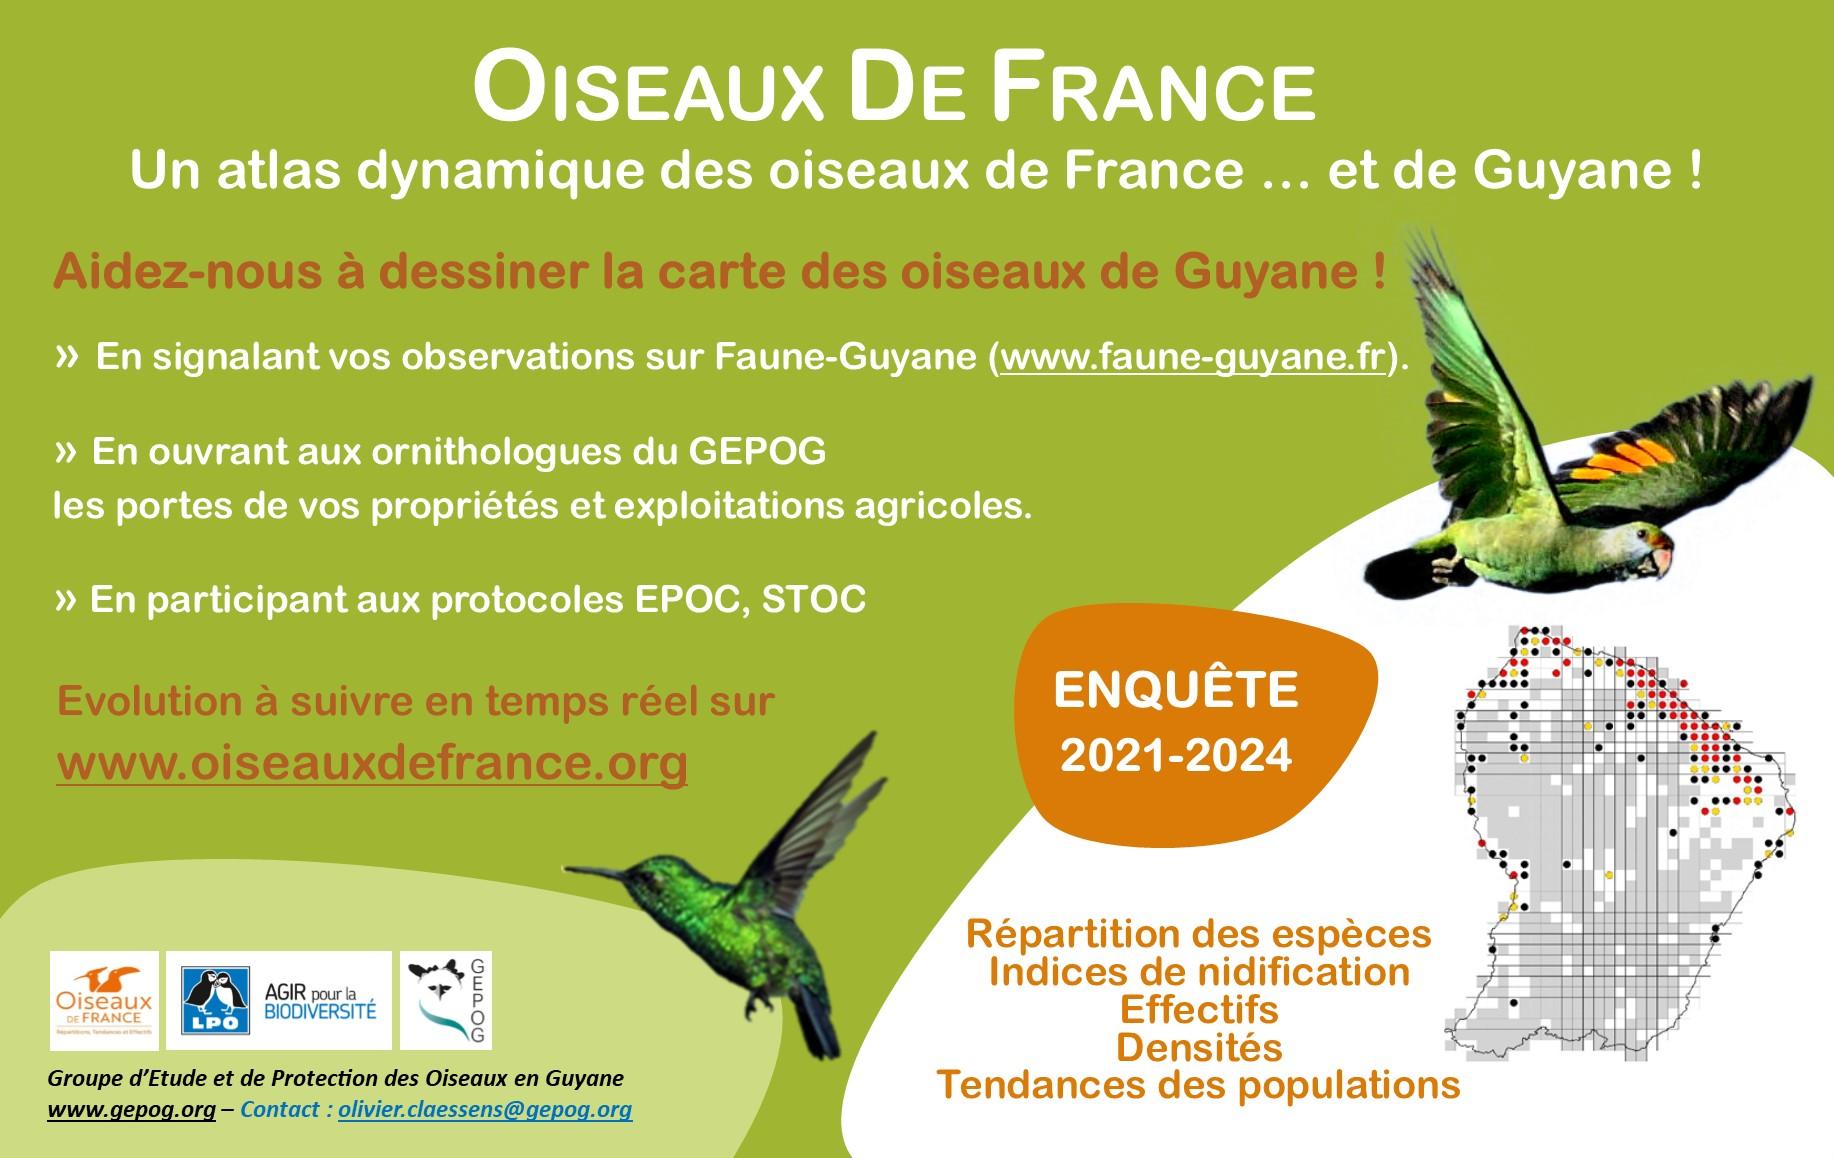 https://cdnfiles1.biolovision.net/www.faune-guyane.fr/userfiles/Documentsdivers/Oiseaux/AFFICHEODFclaire.jpg